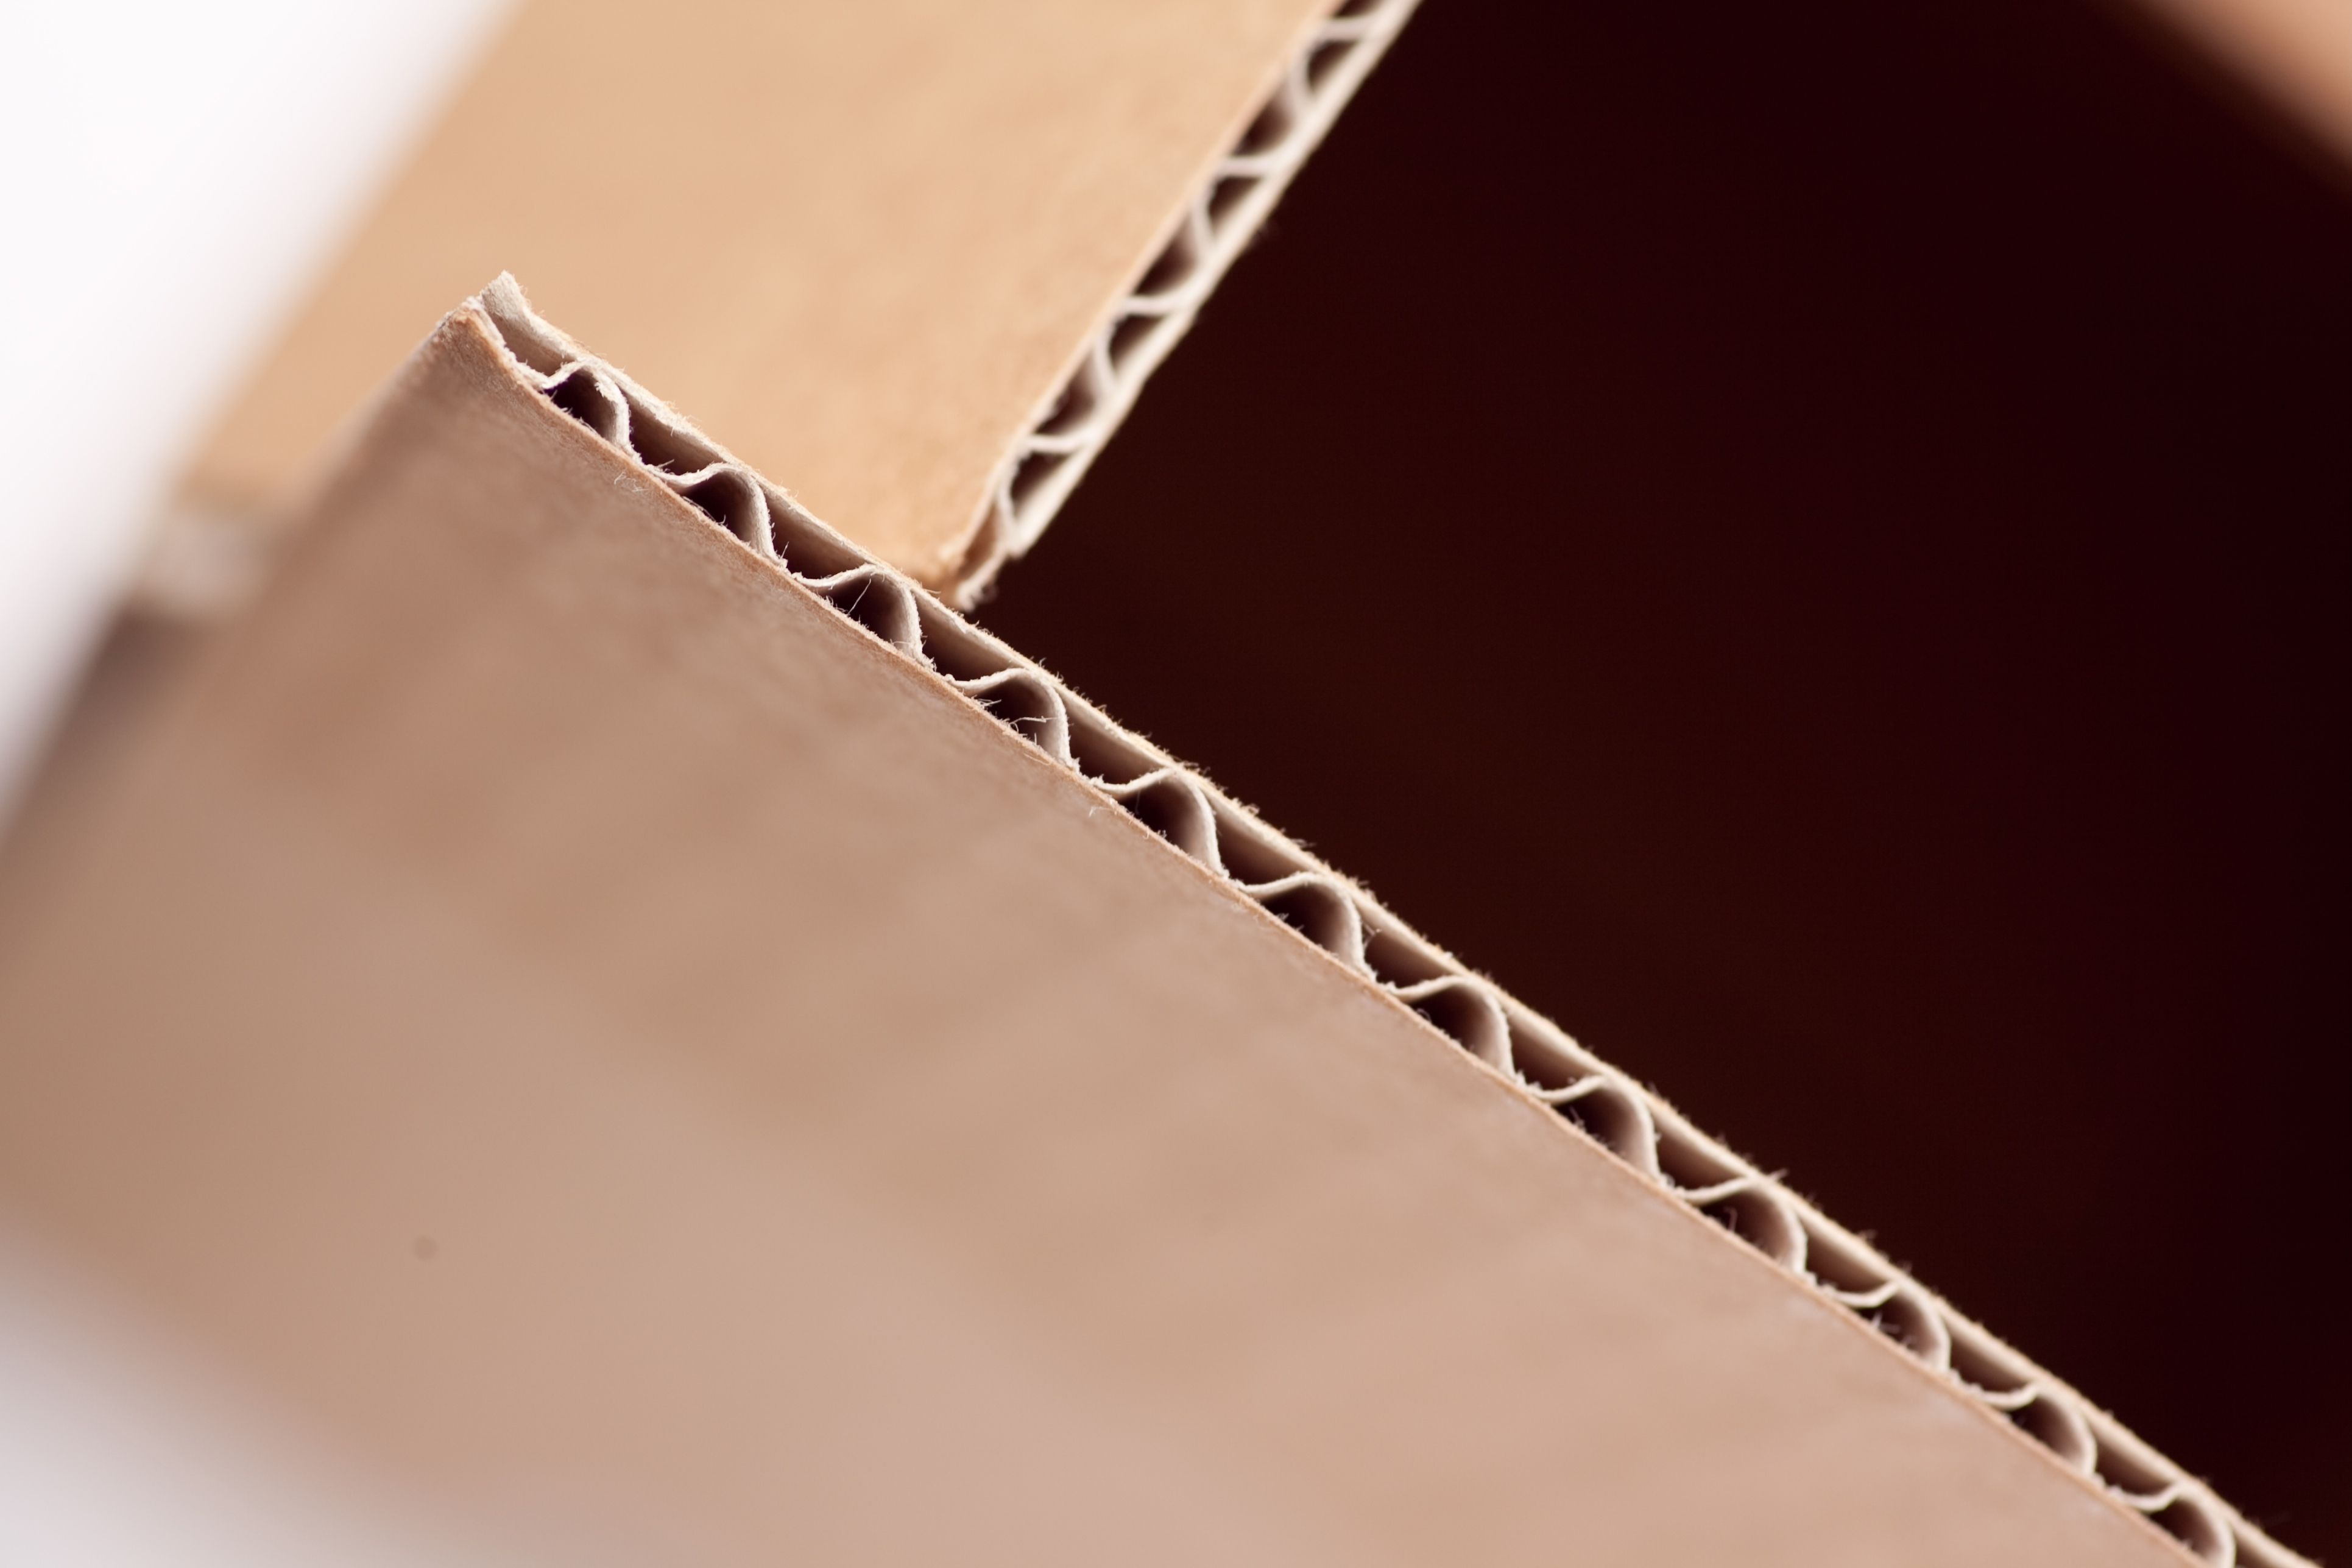 254 x 203 x 152mm Single Wall Cardboard Boxes - 4